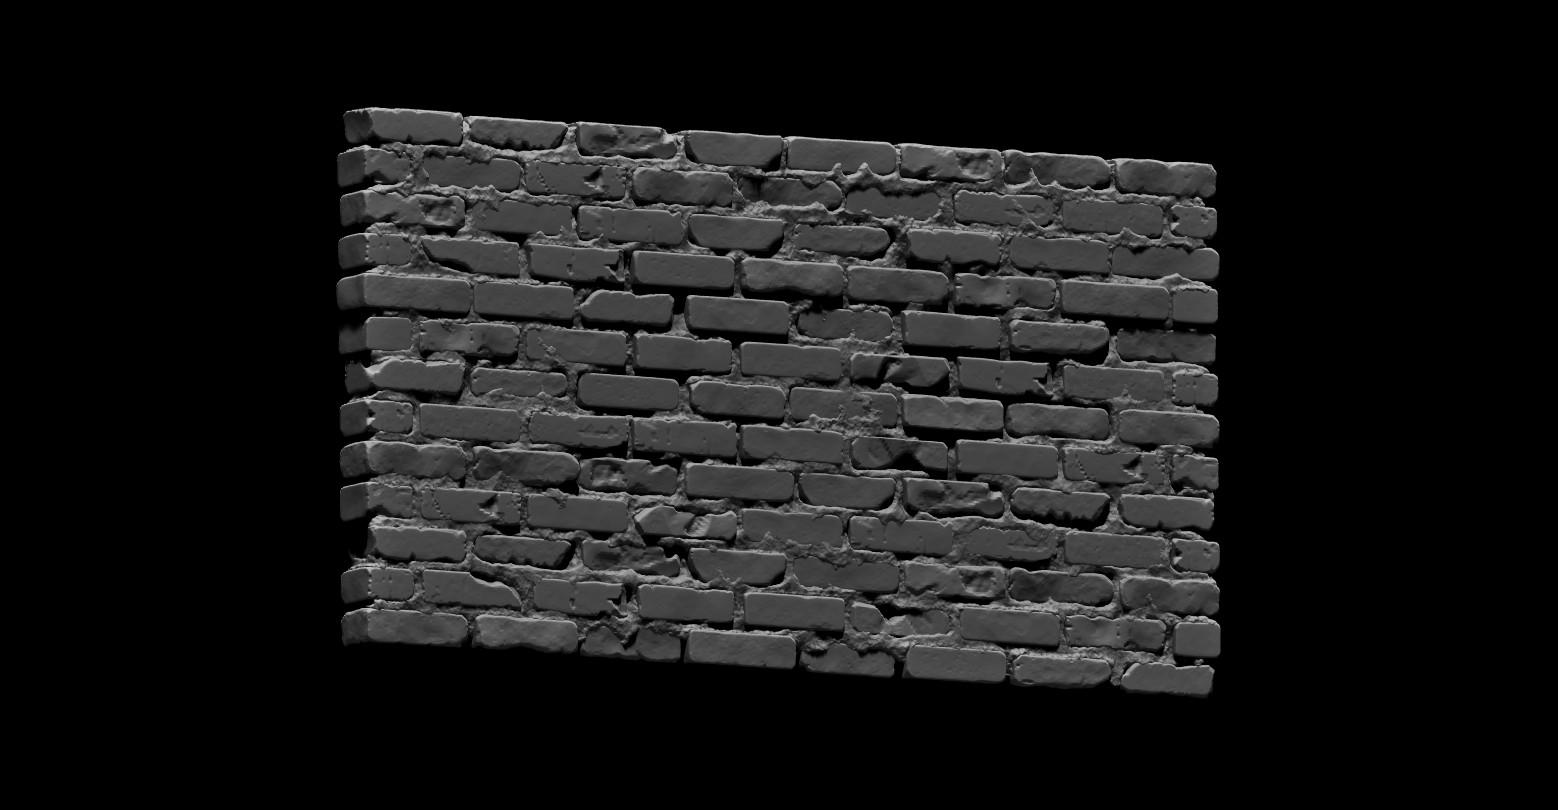 Bela csampai brick wall 01 render zb 01